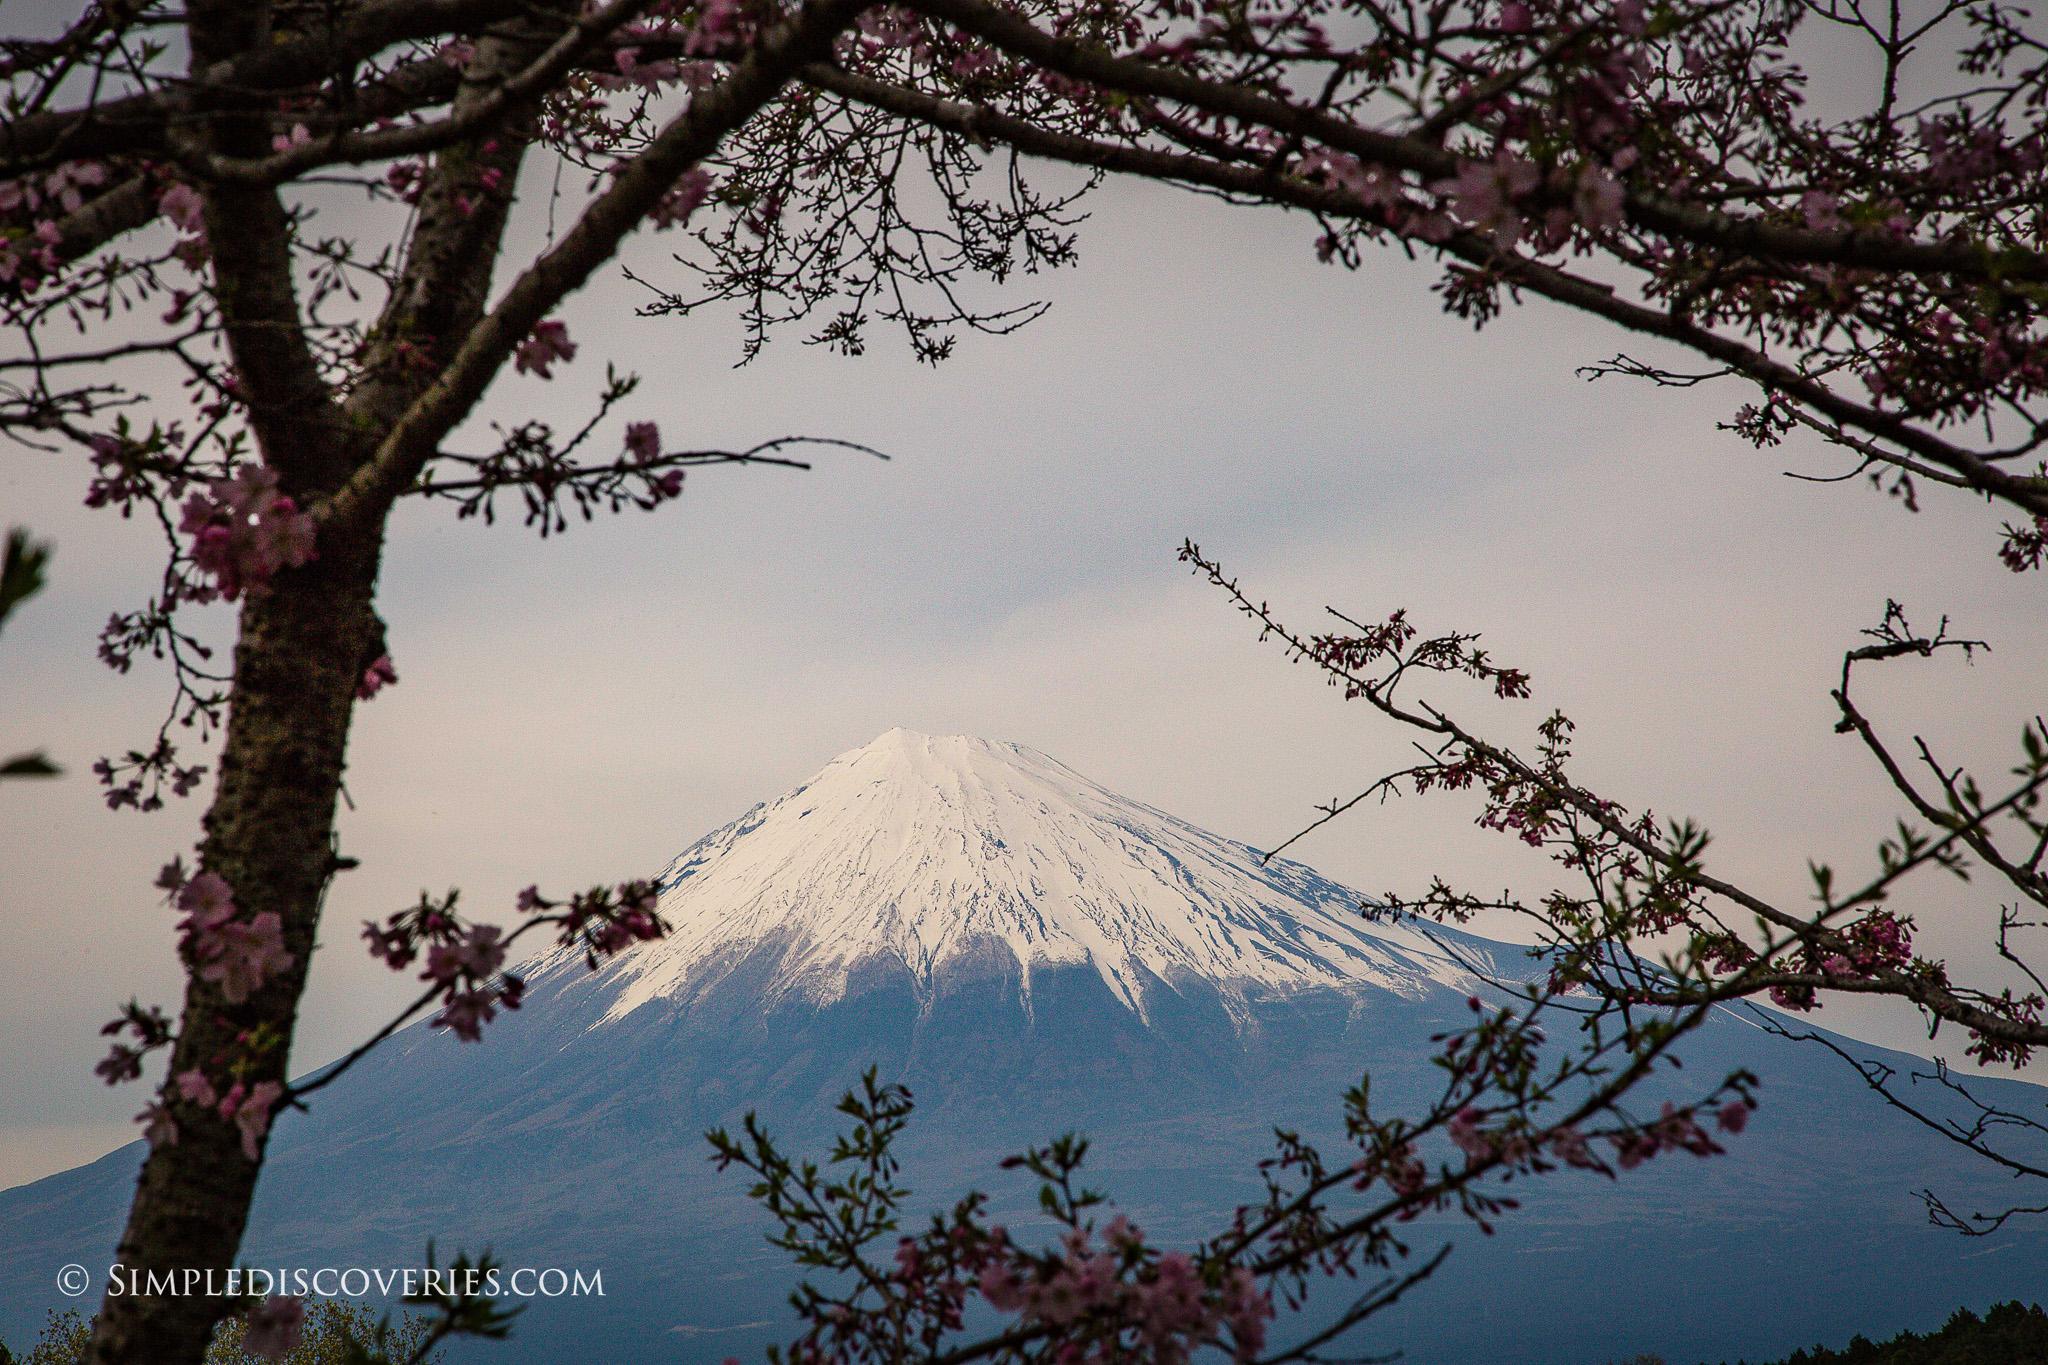 Mount_Fuji_Japan